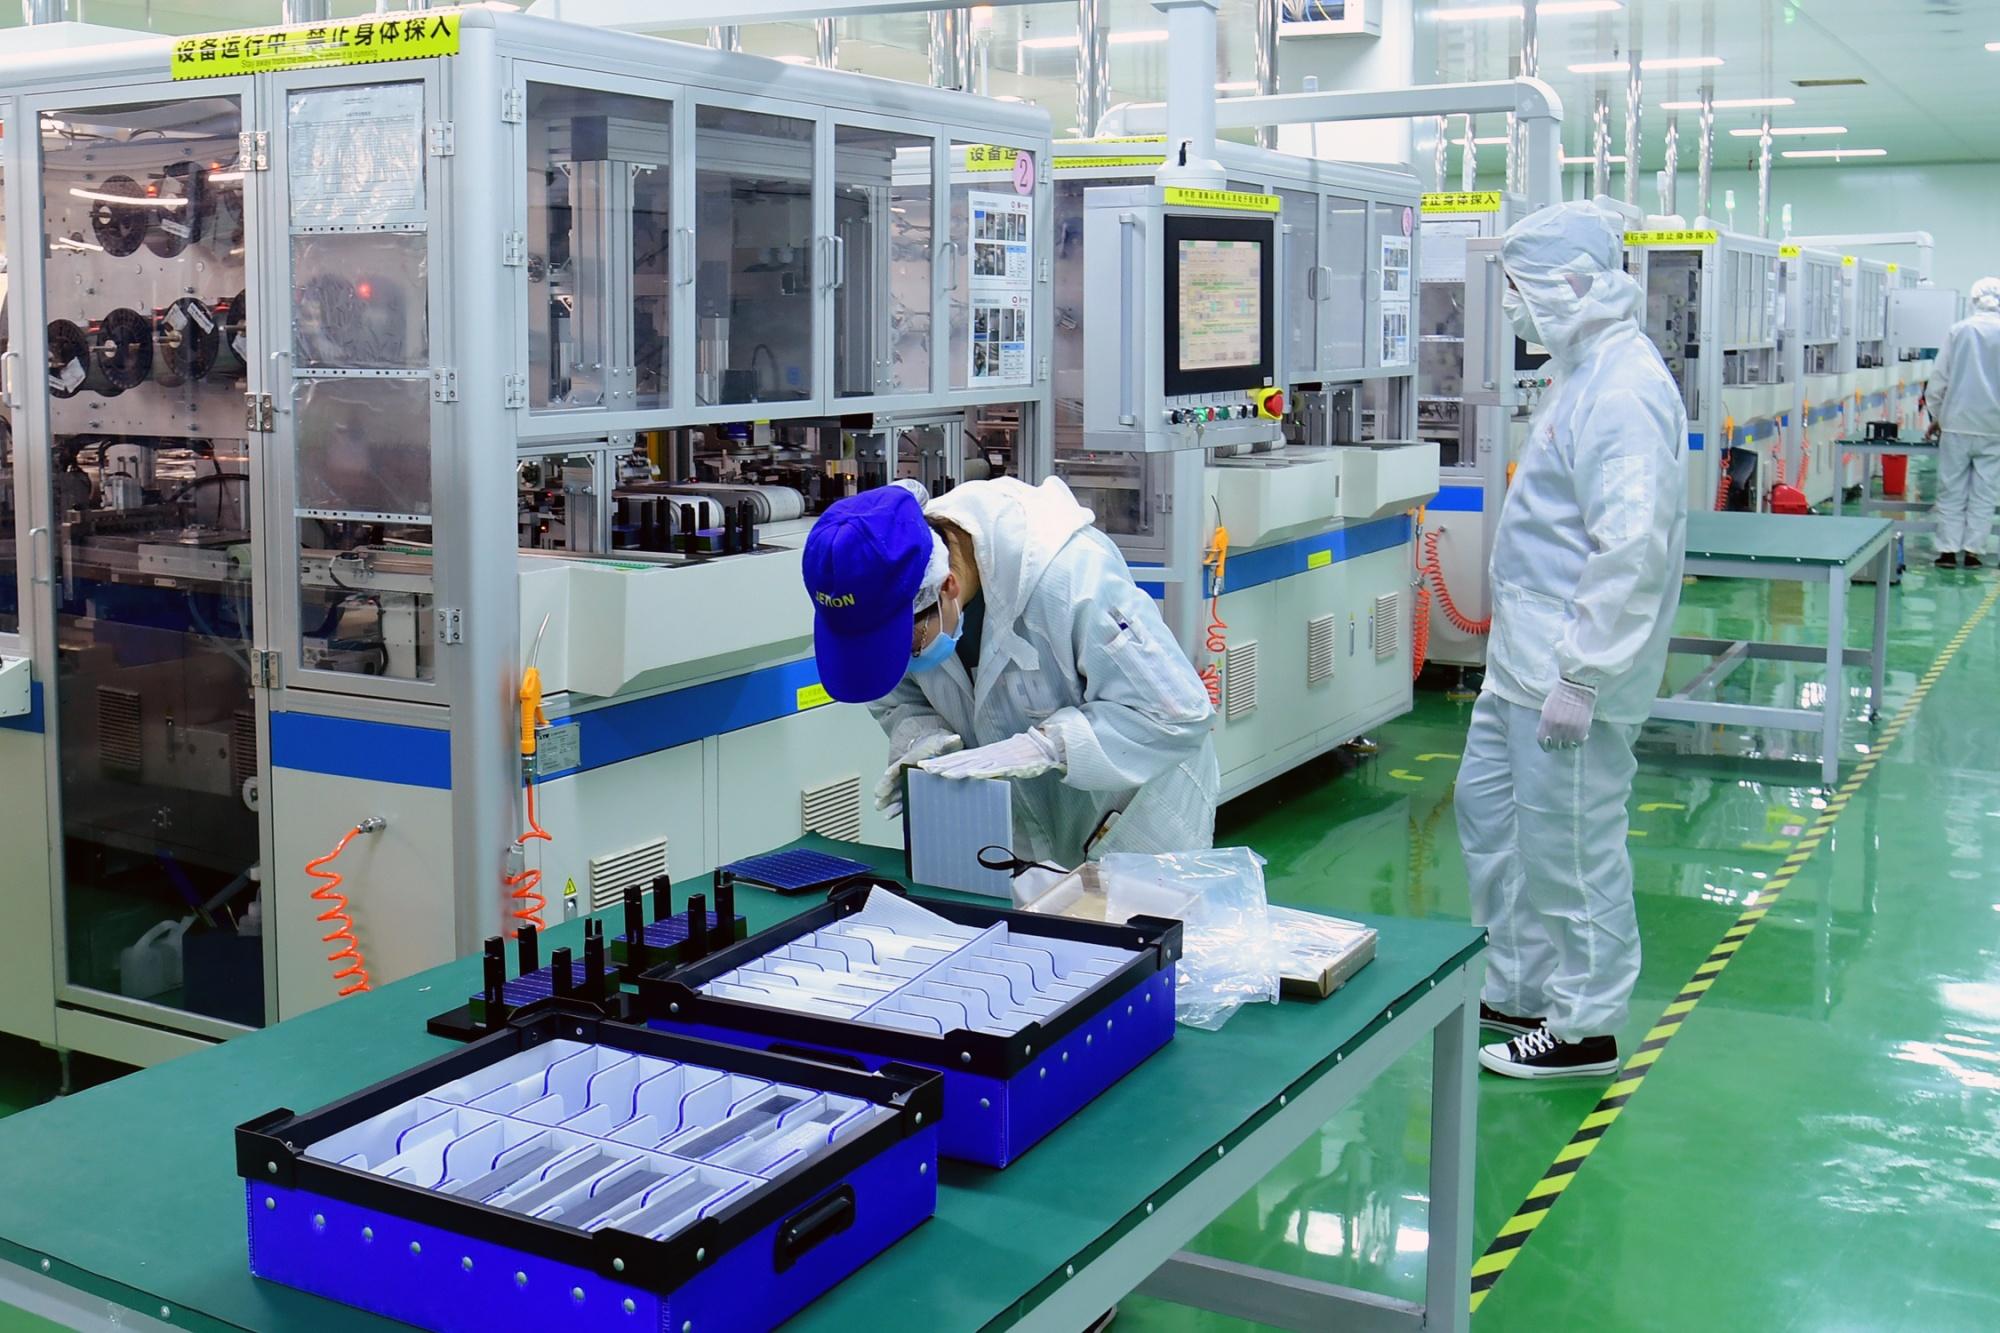 Photovoltaic Solar Module Production in Hai'an City